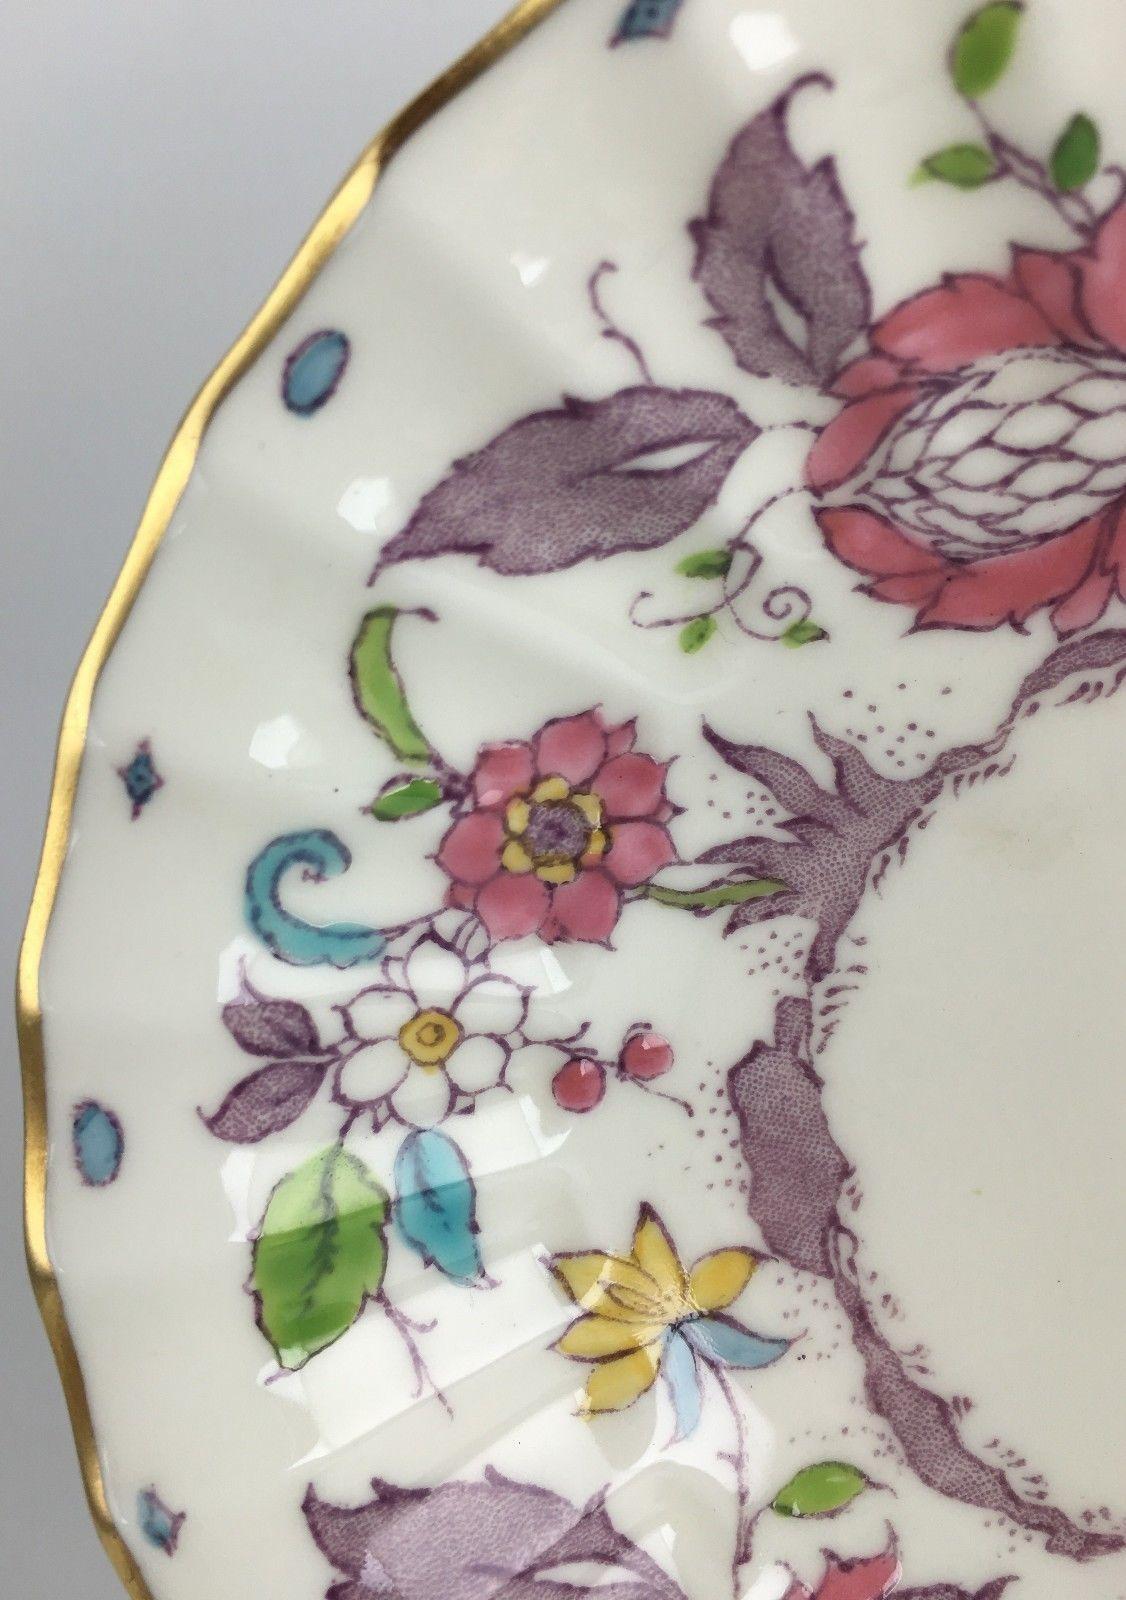 Royal Worcester KASHMIR fruit bowl (3 available) (SKU EC 03/03) FREE SHIPPING image 2